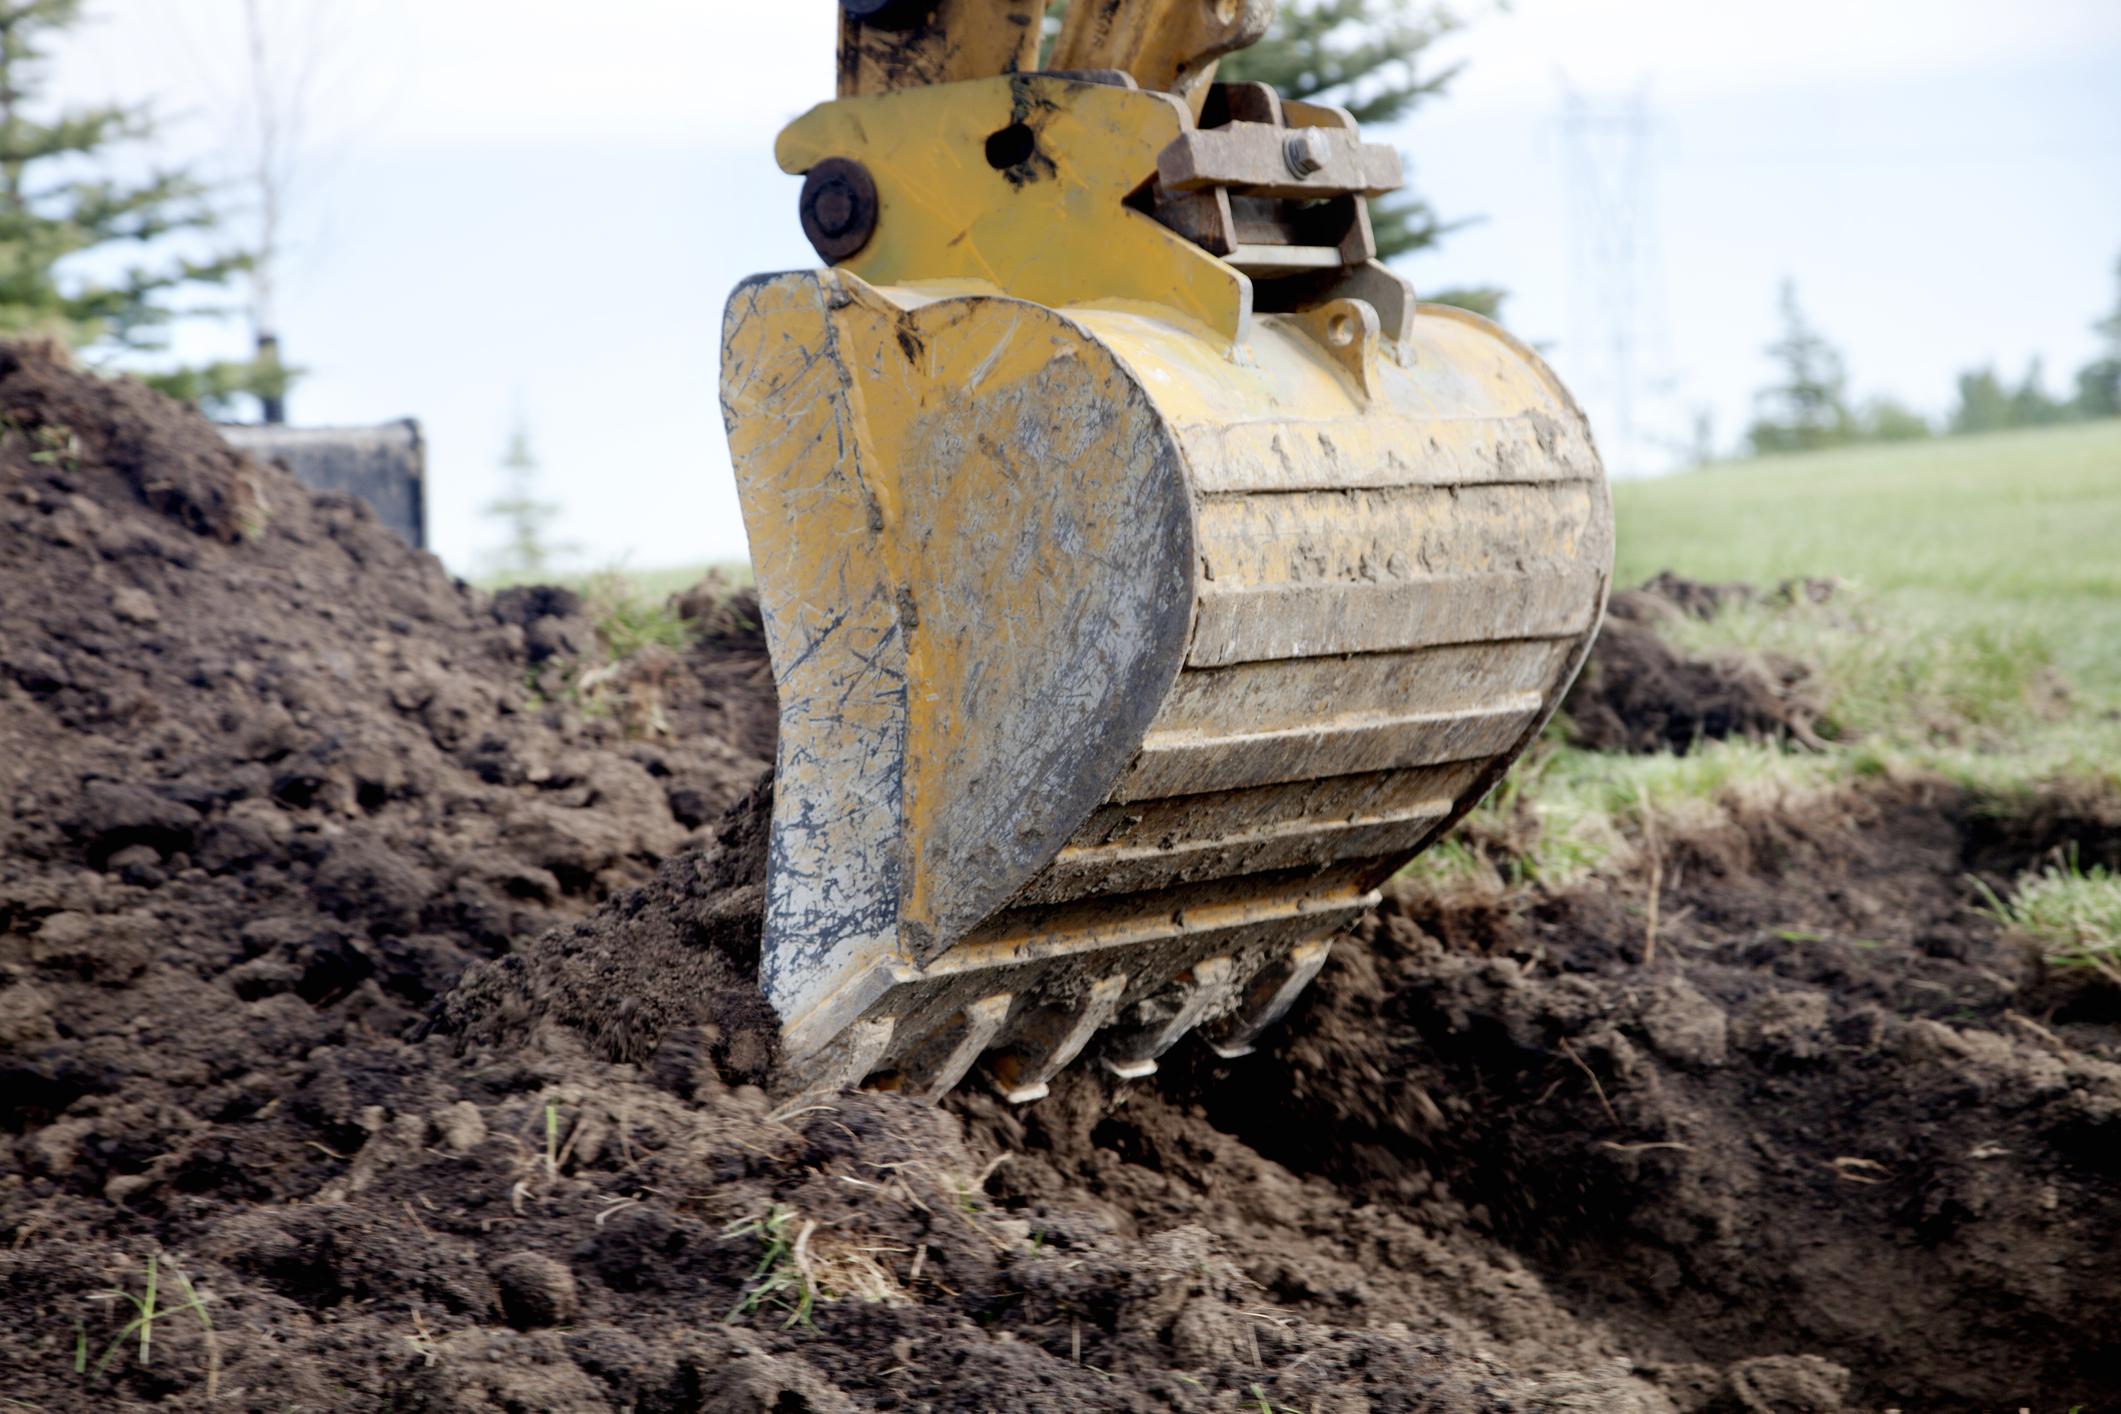 PHC0521_backhoe-digging-trench.jpg